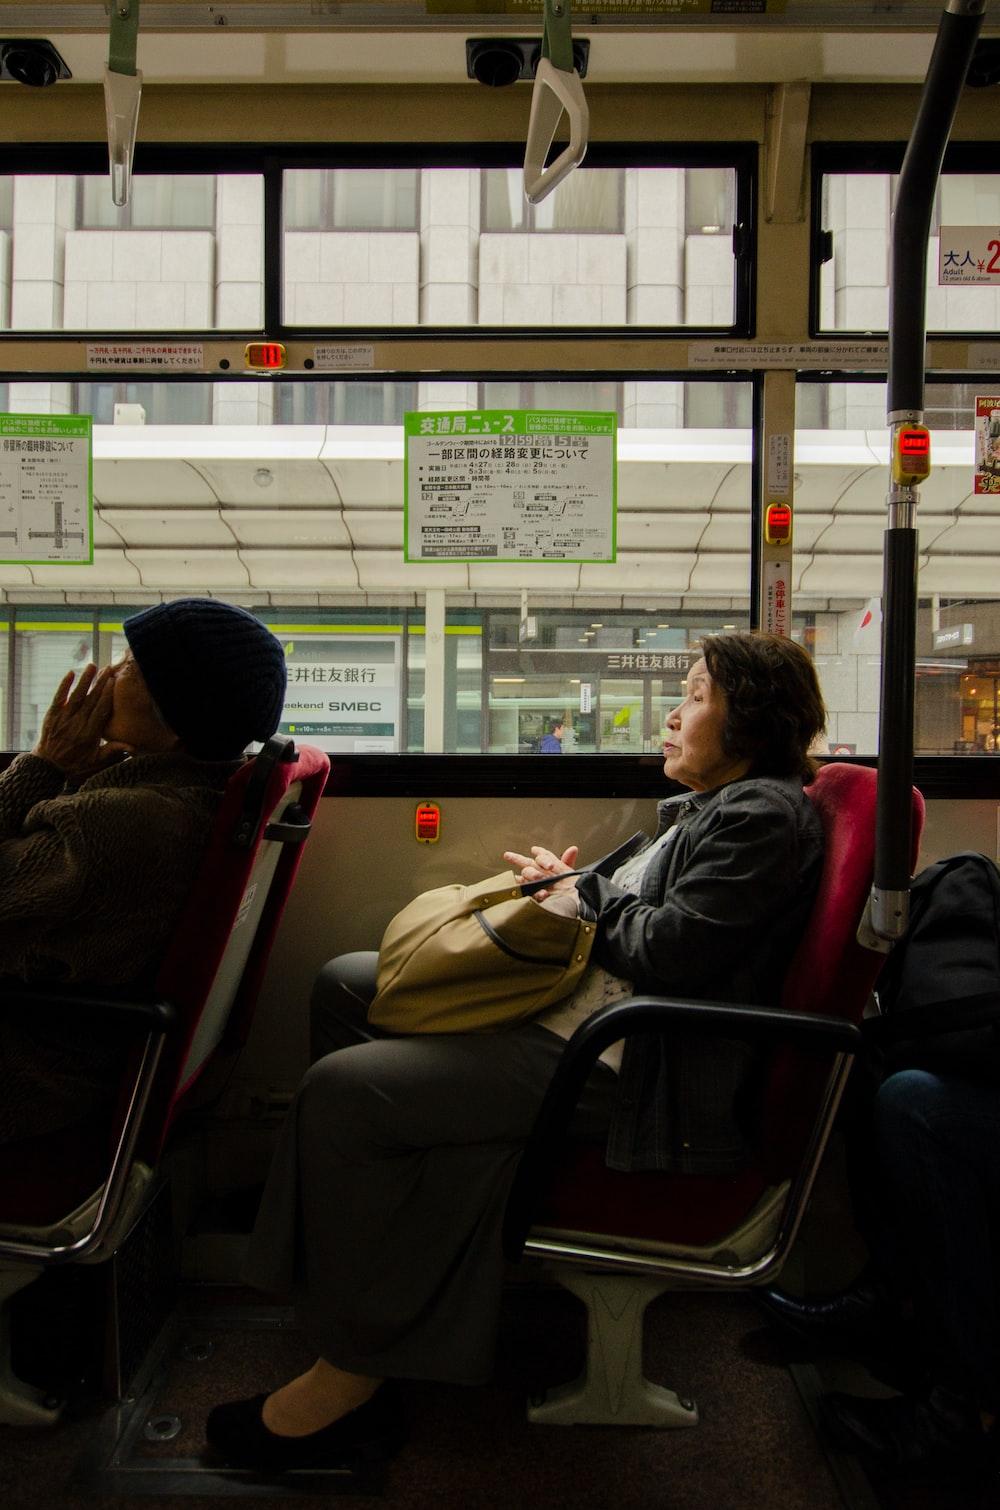 woman sitting inside vehicle seat during daytime